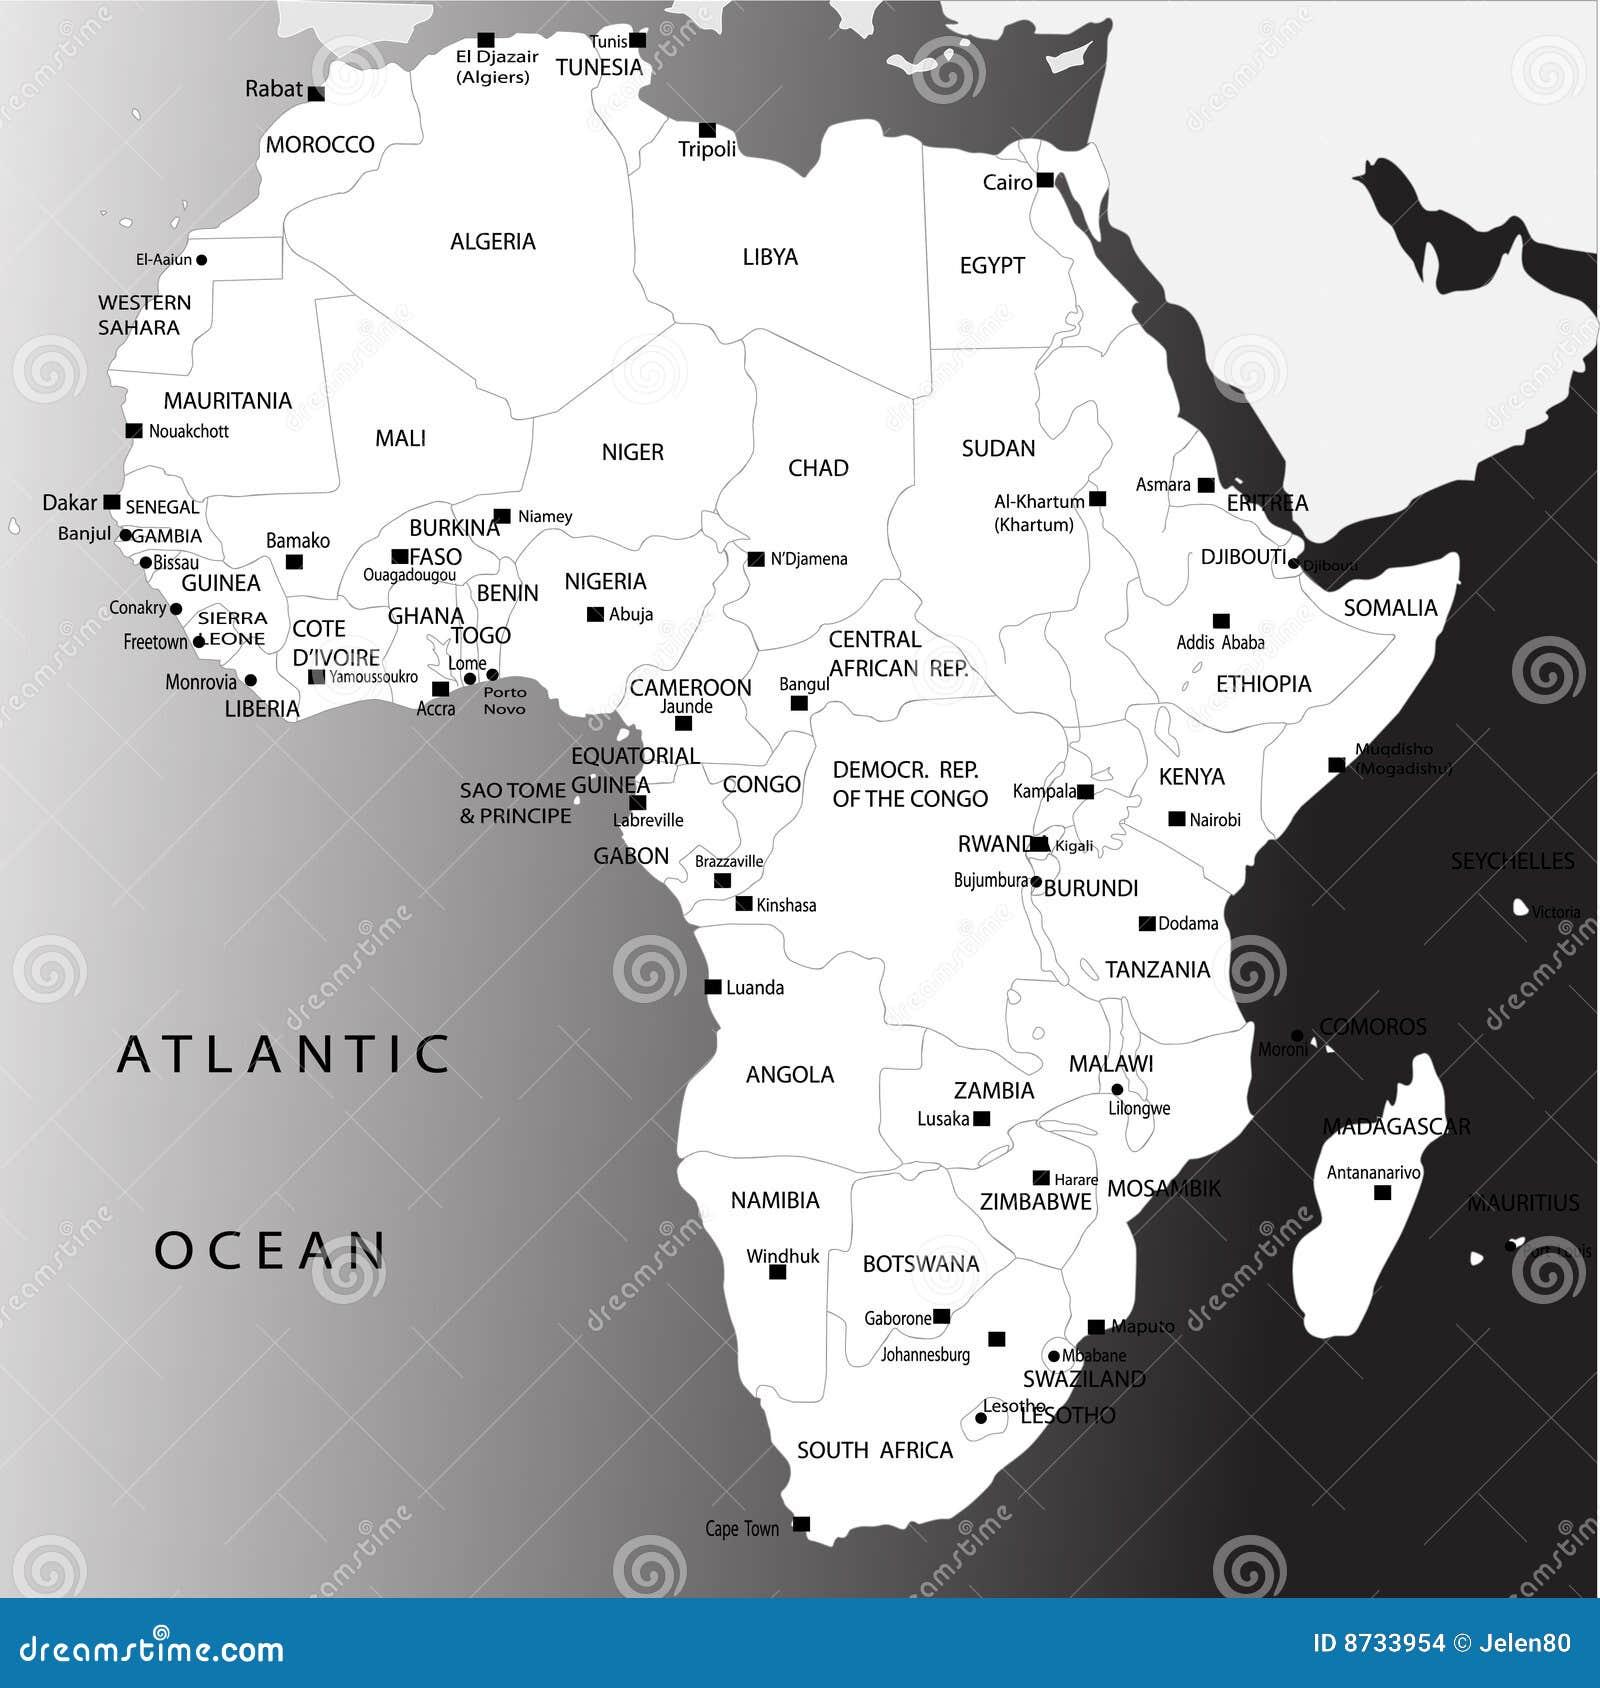 Africa Maps With Capitals Africa Maps With Capitals